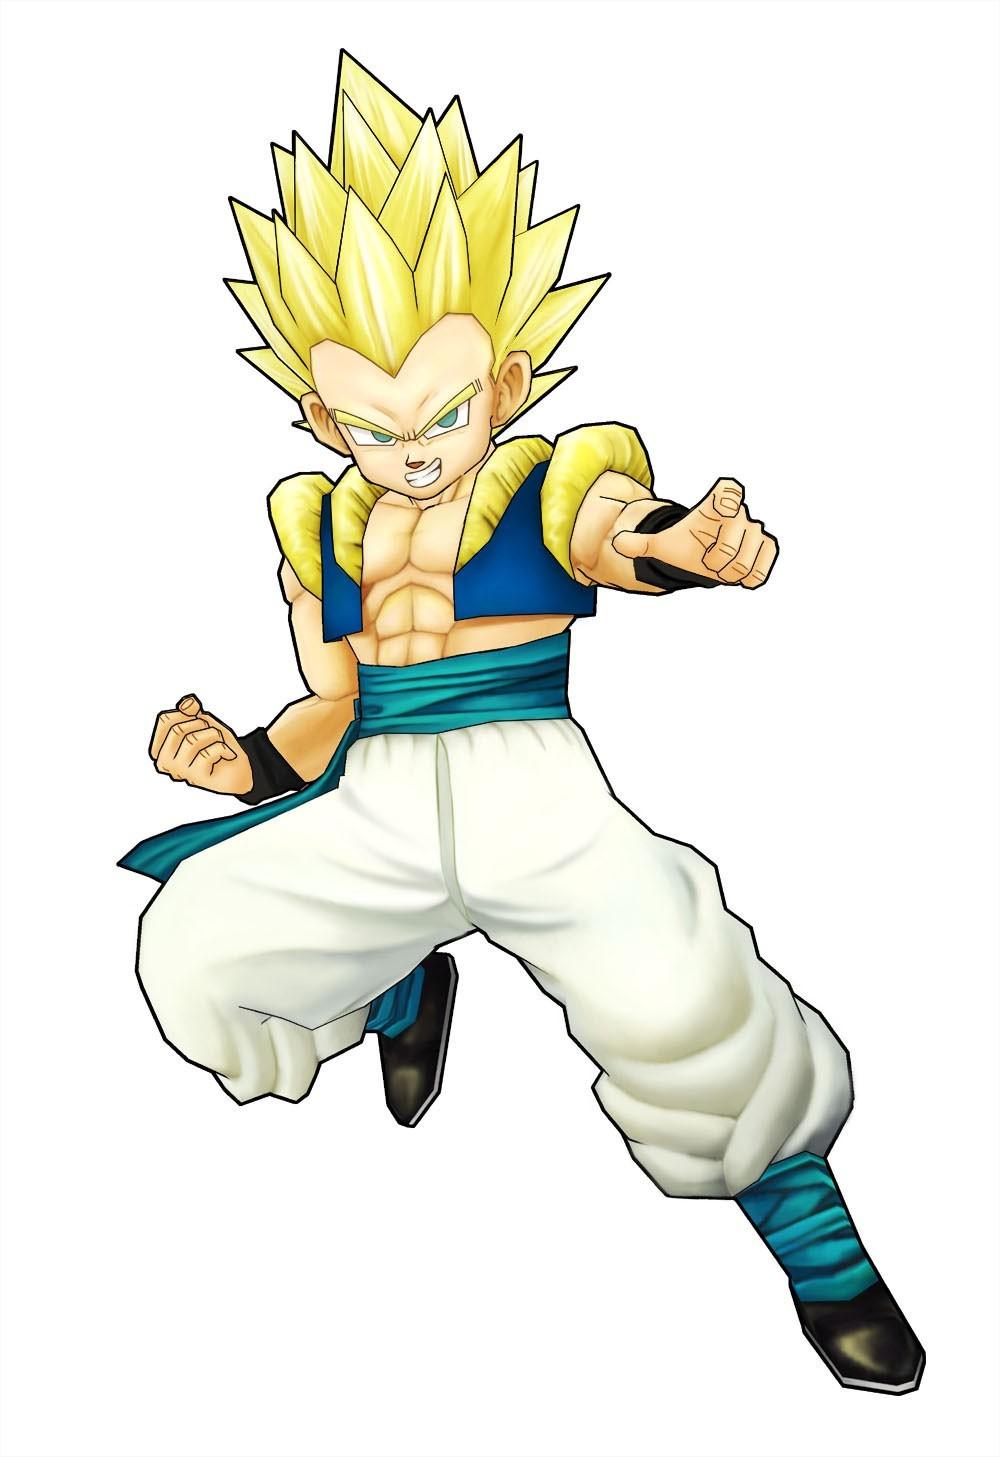 Des nouvelles images de dragon ball z tenkaichi tag team - Image de dragon ball z ...